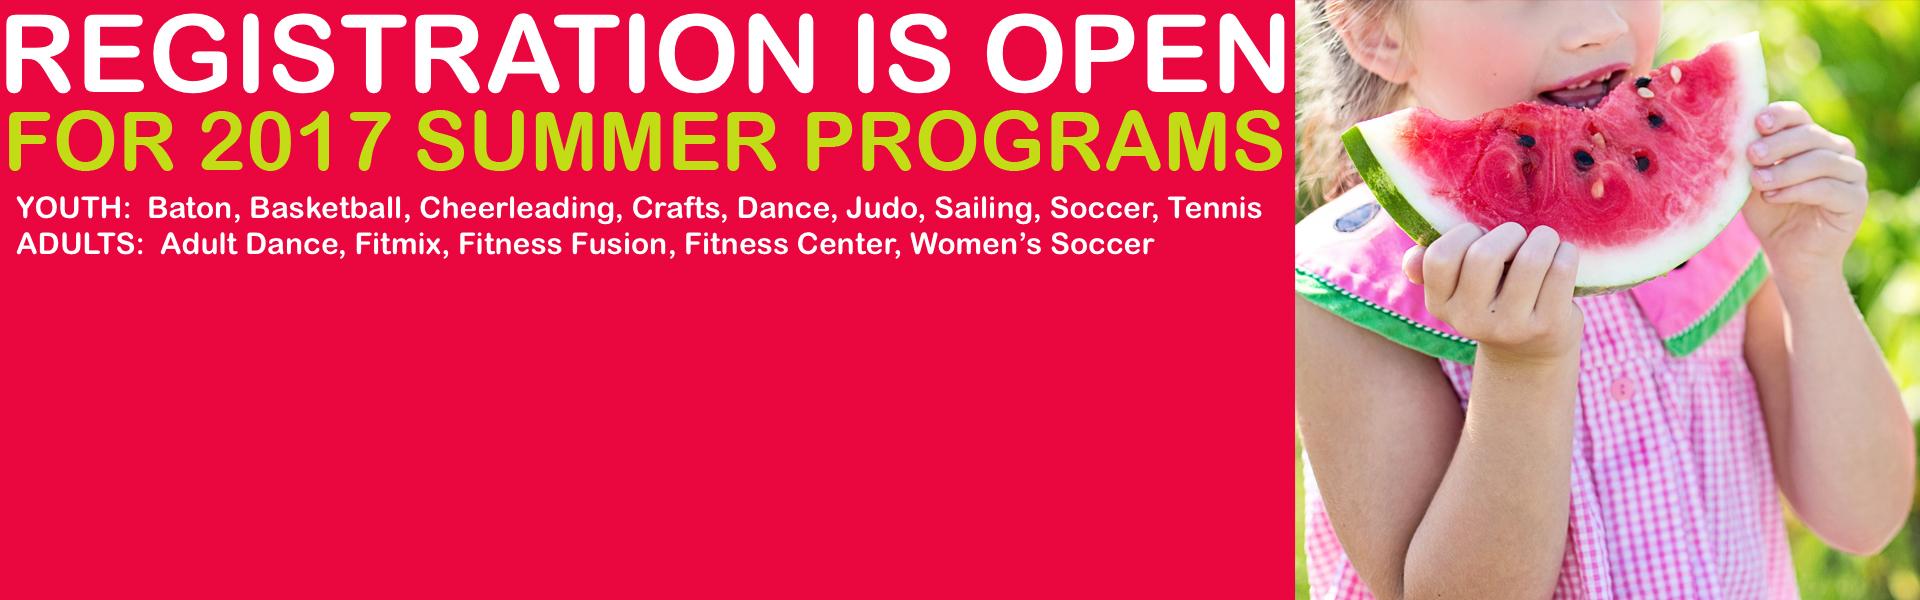 banner Summer programs 2017